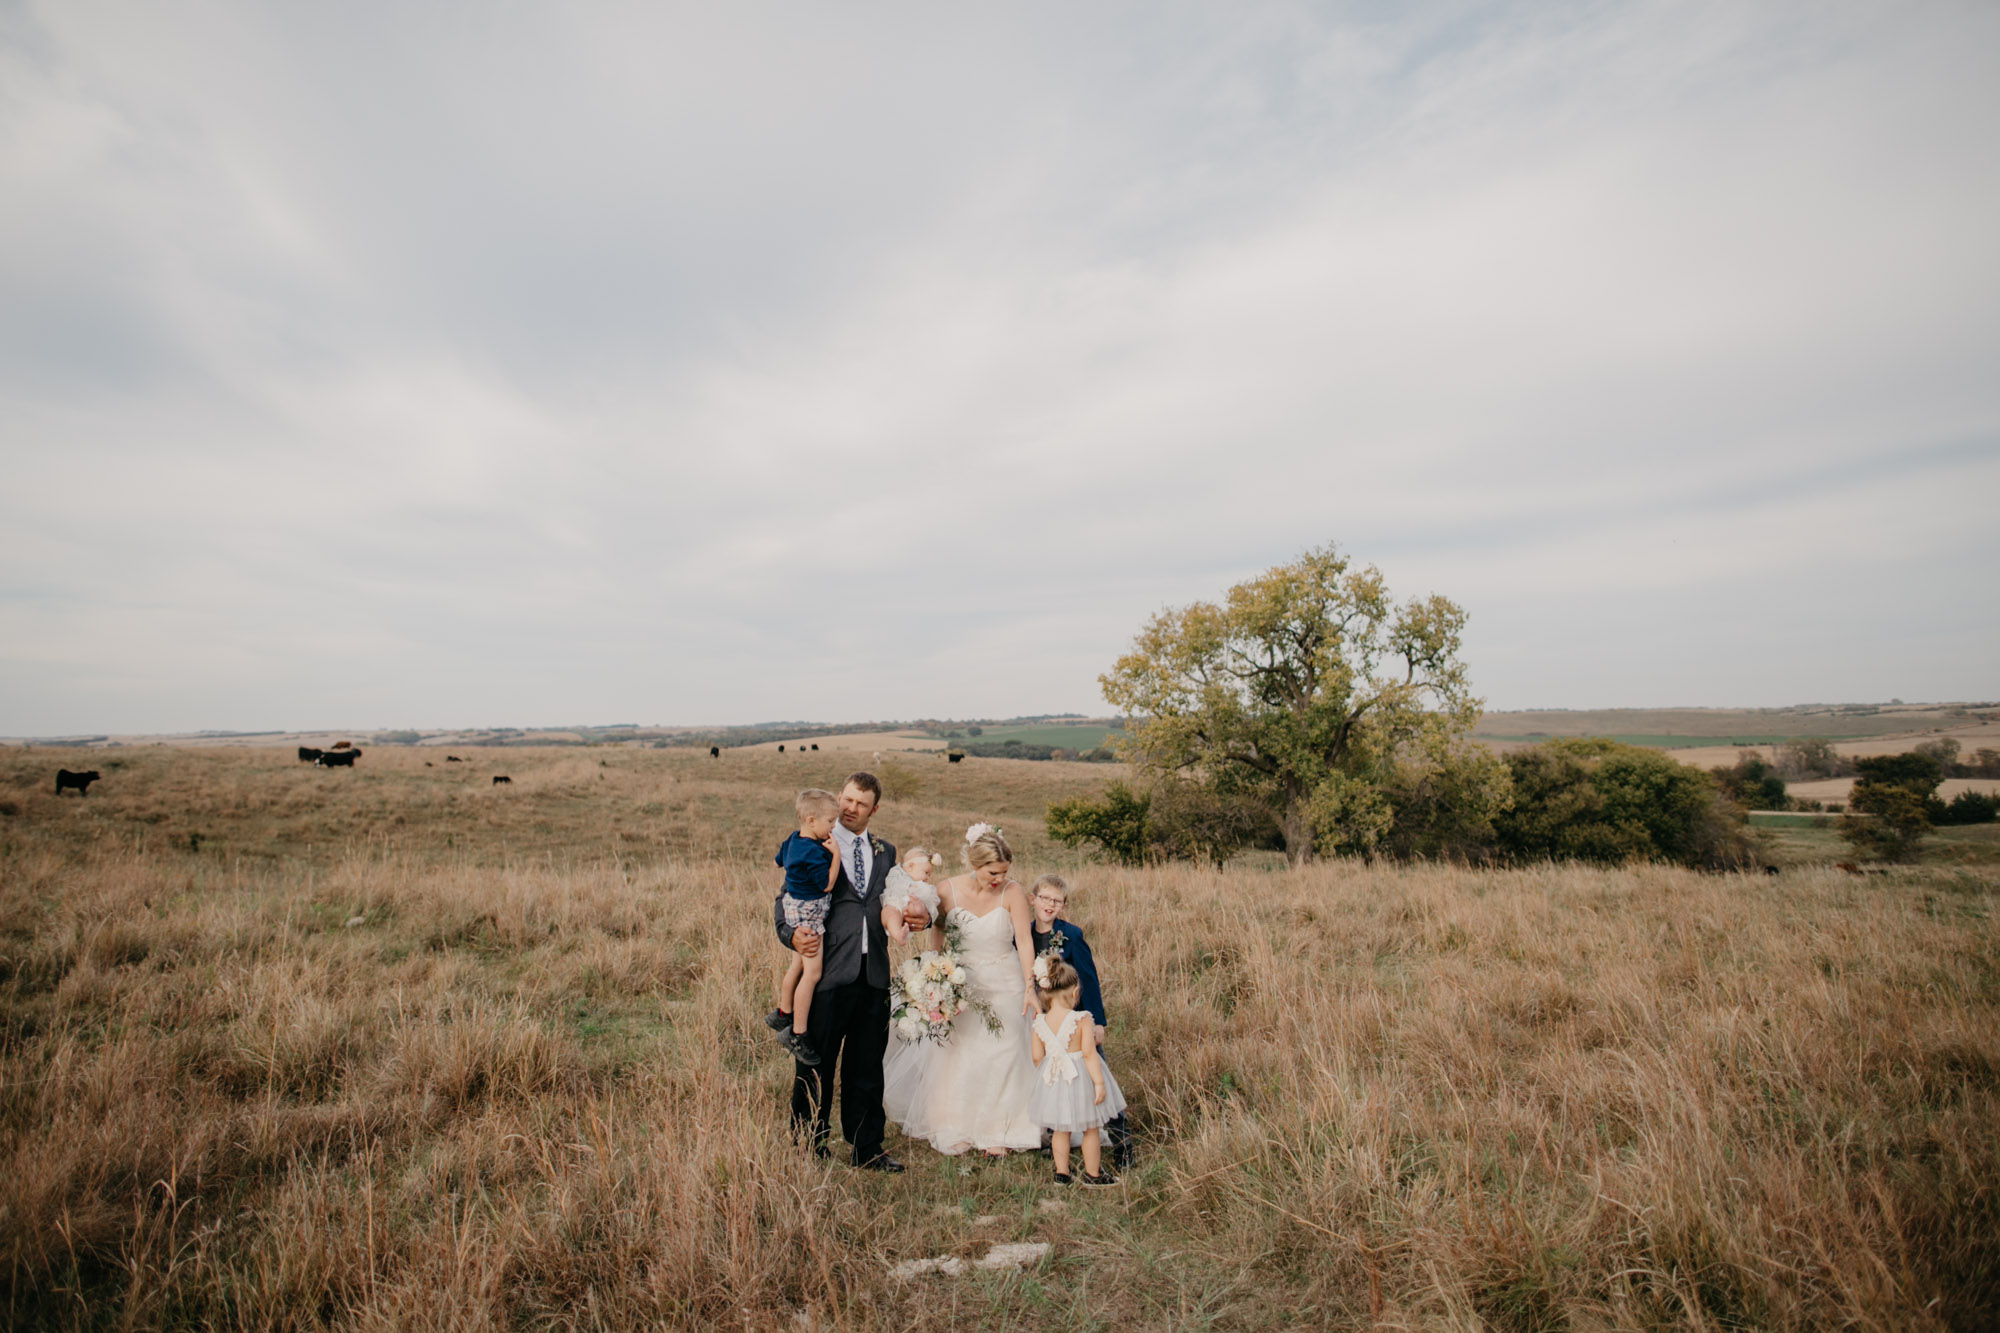 omaha-wedding-photographer-meghan-time-26.jpg